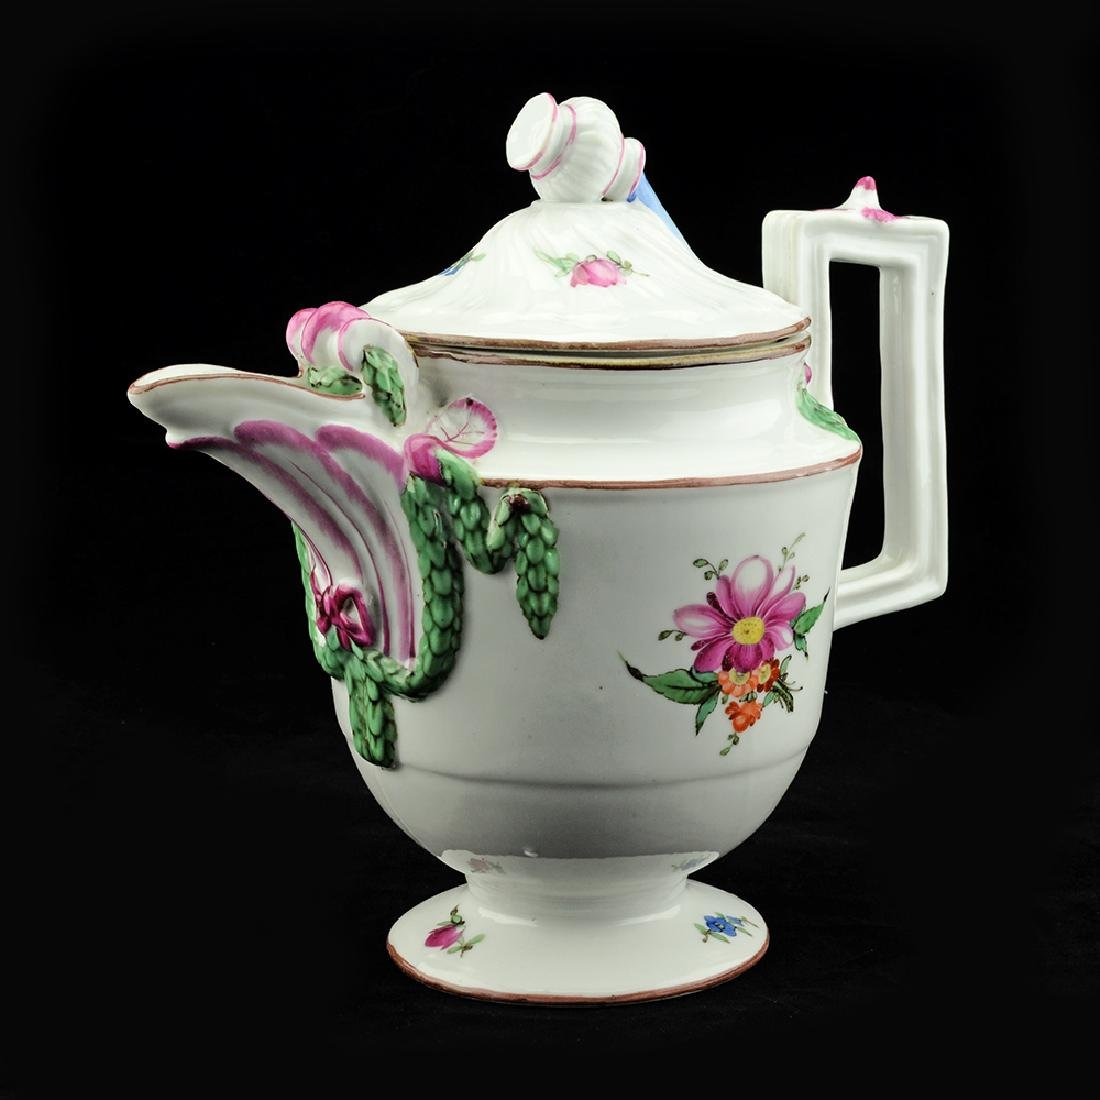 Rare Gardner Porcelain Coffee Pot 1780